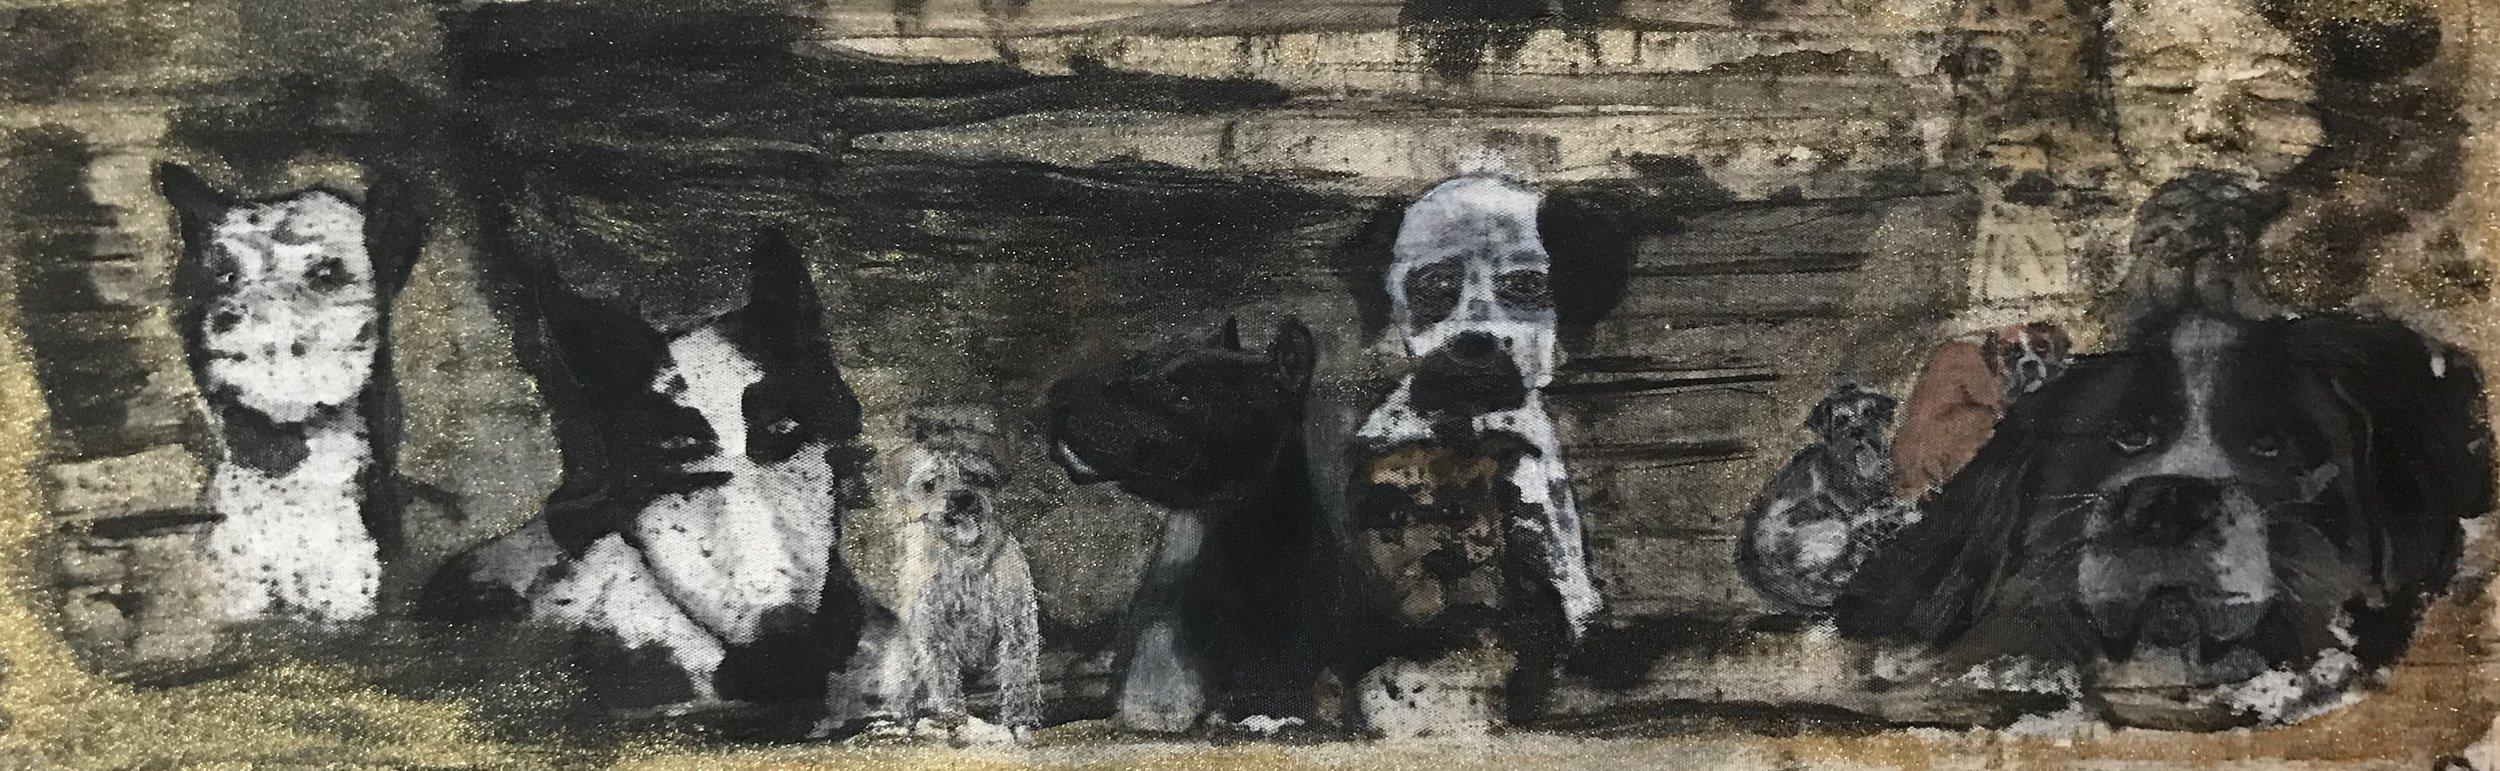 Hunddrömmar